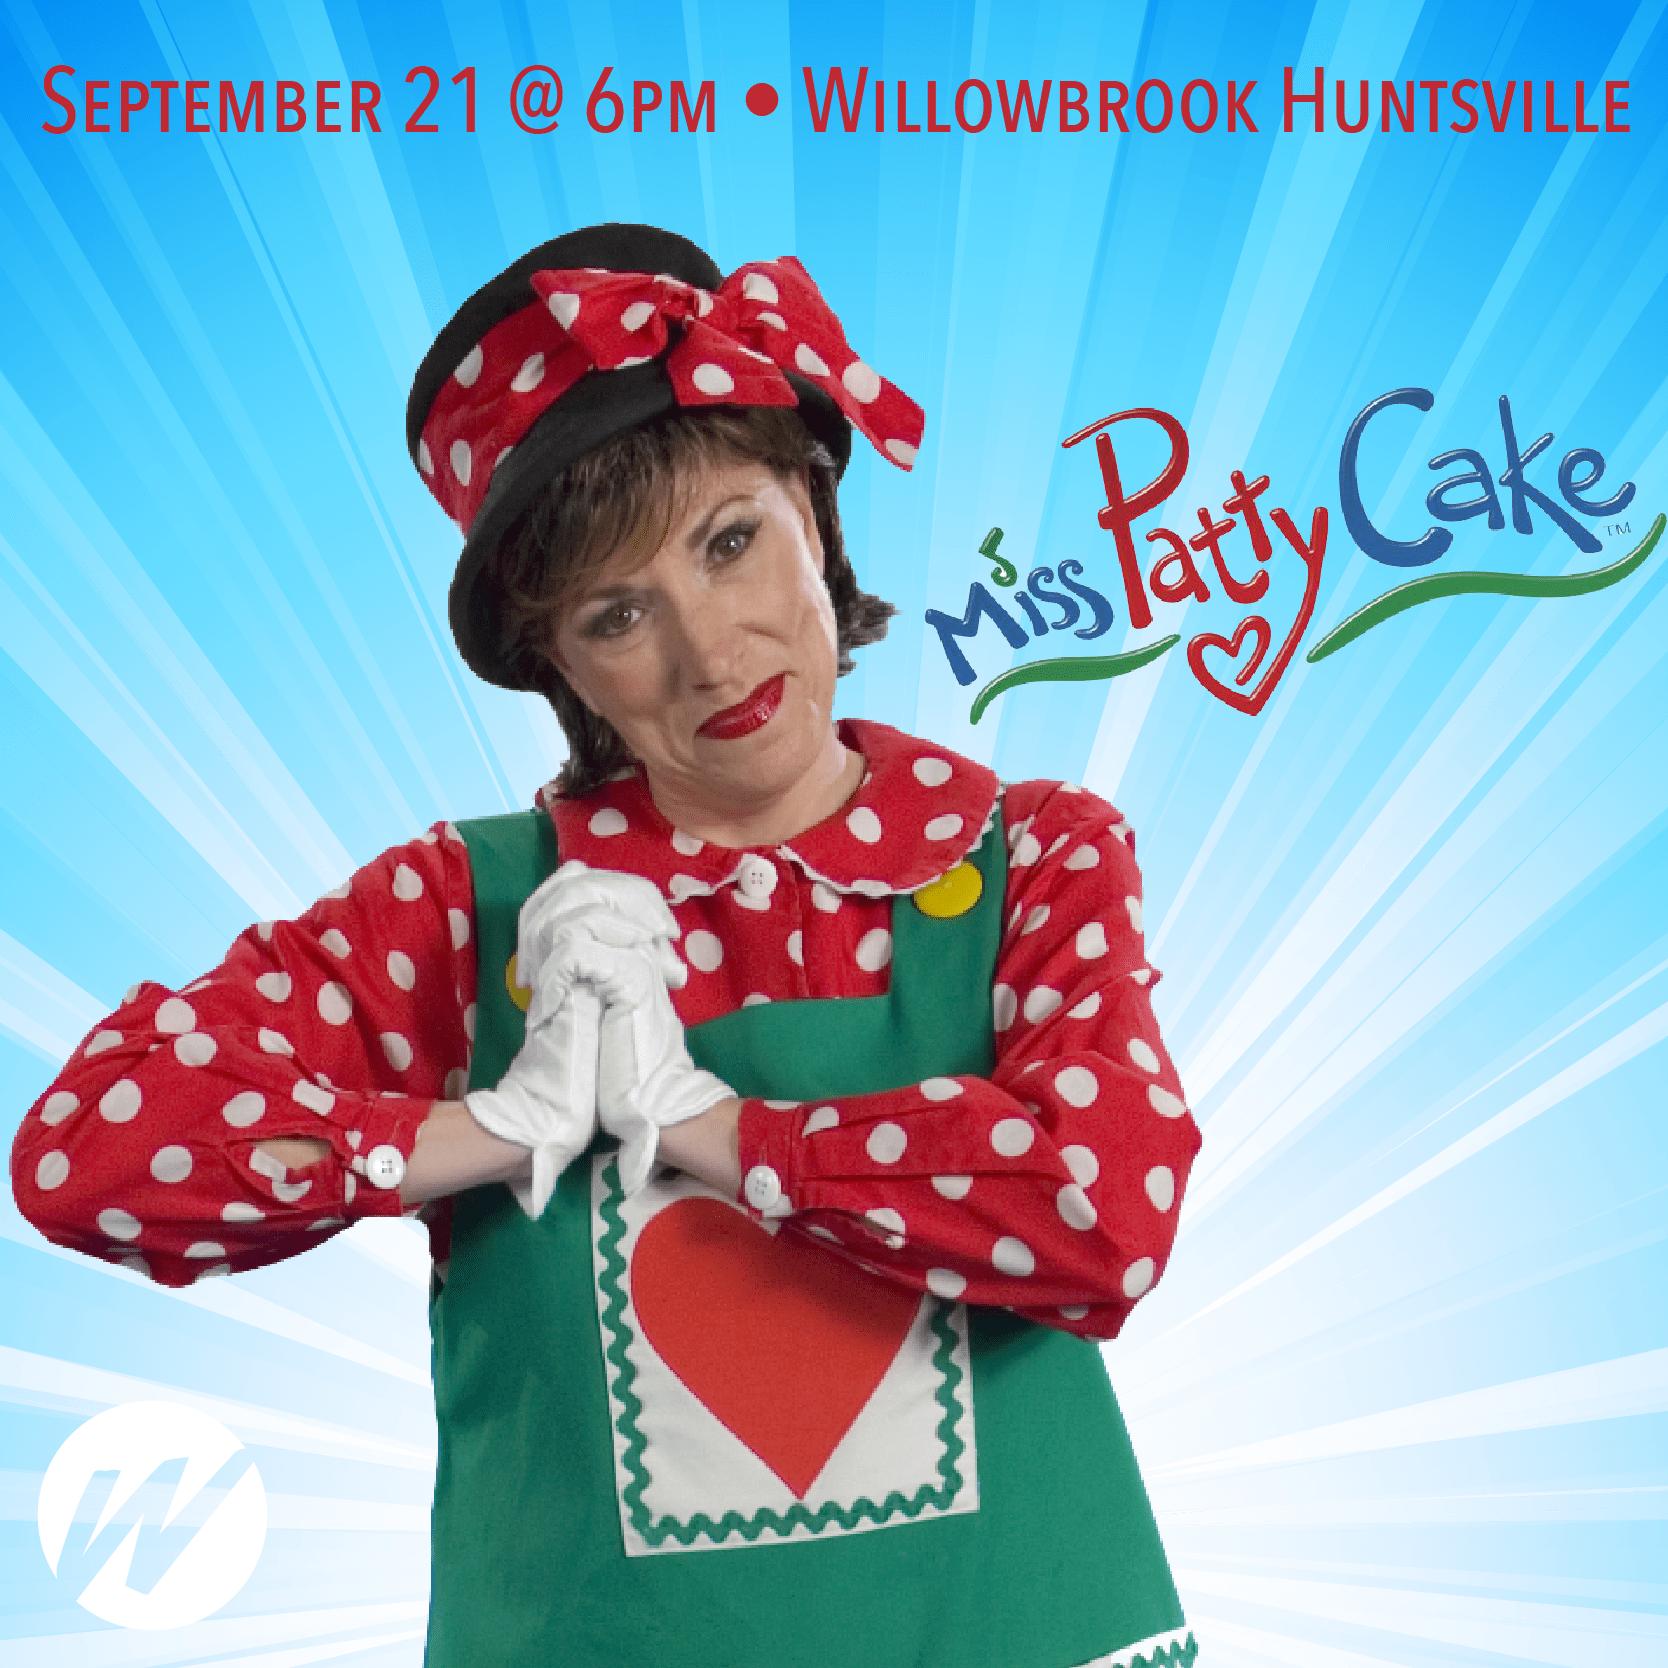 Miss Patty Cake Concert